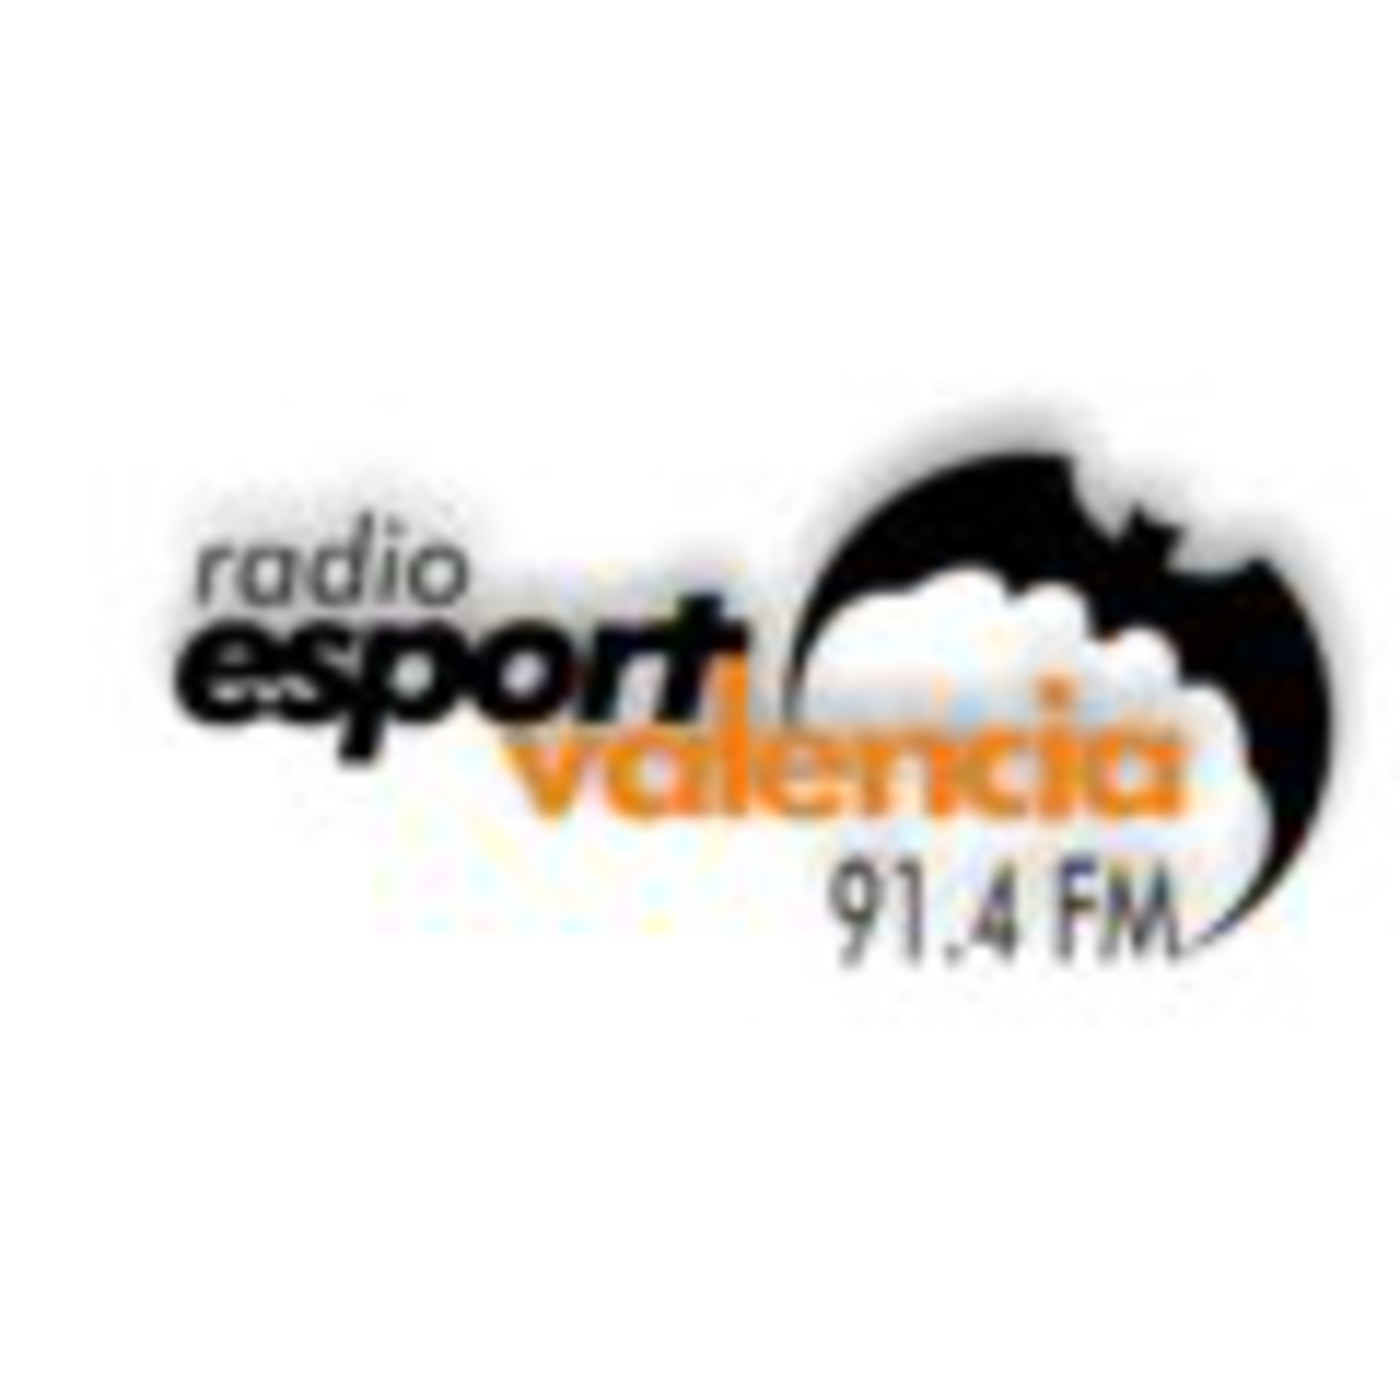 radioesport914